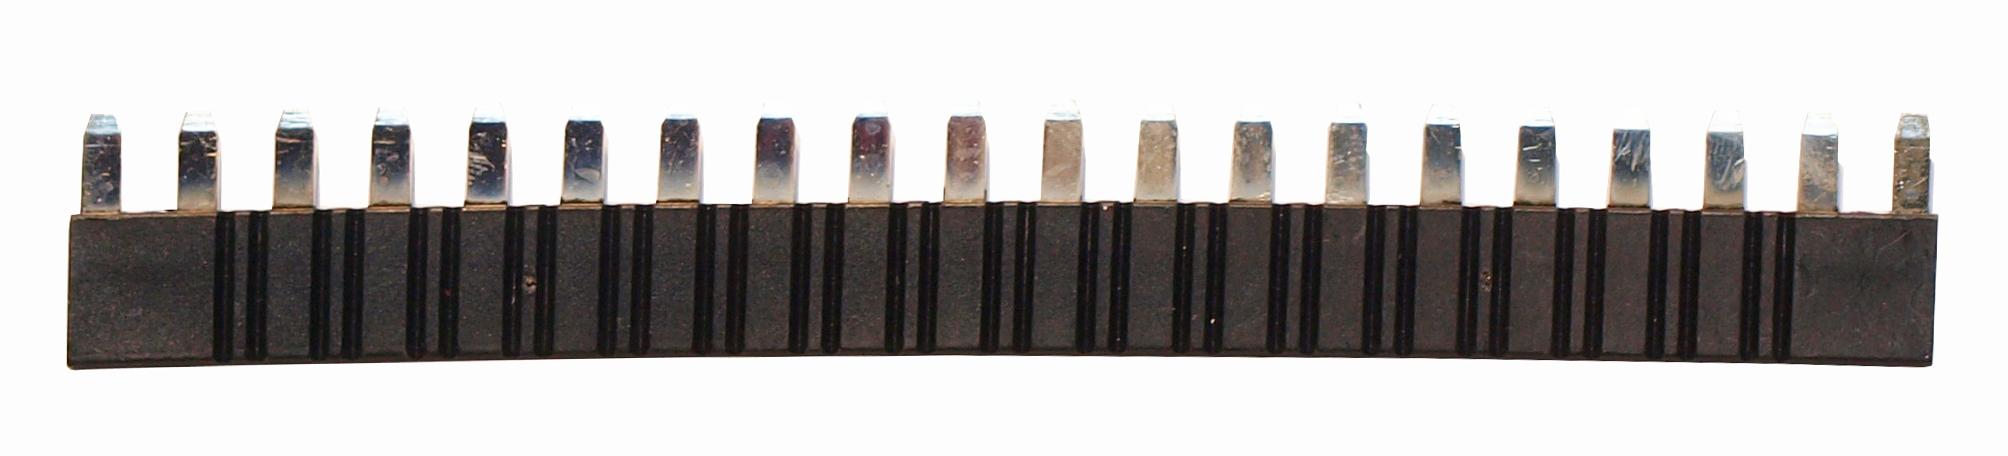 1 Stk Kontaktbrücke 20-polig für YSN78024 YSN90020--